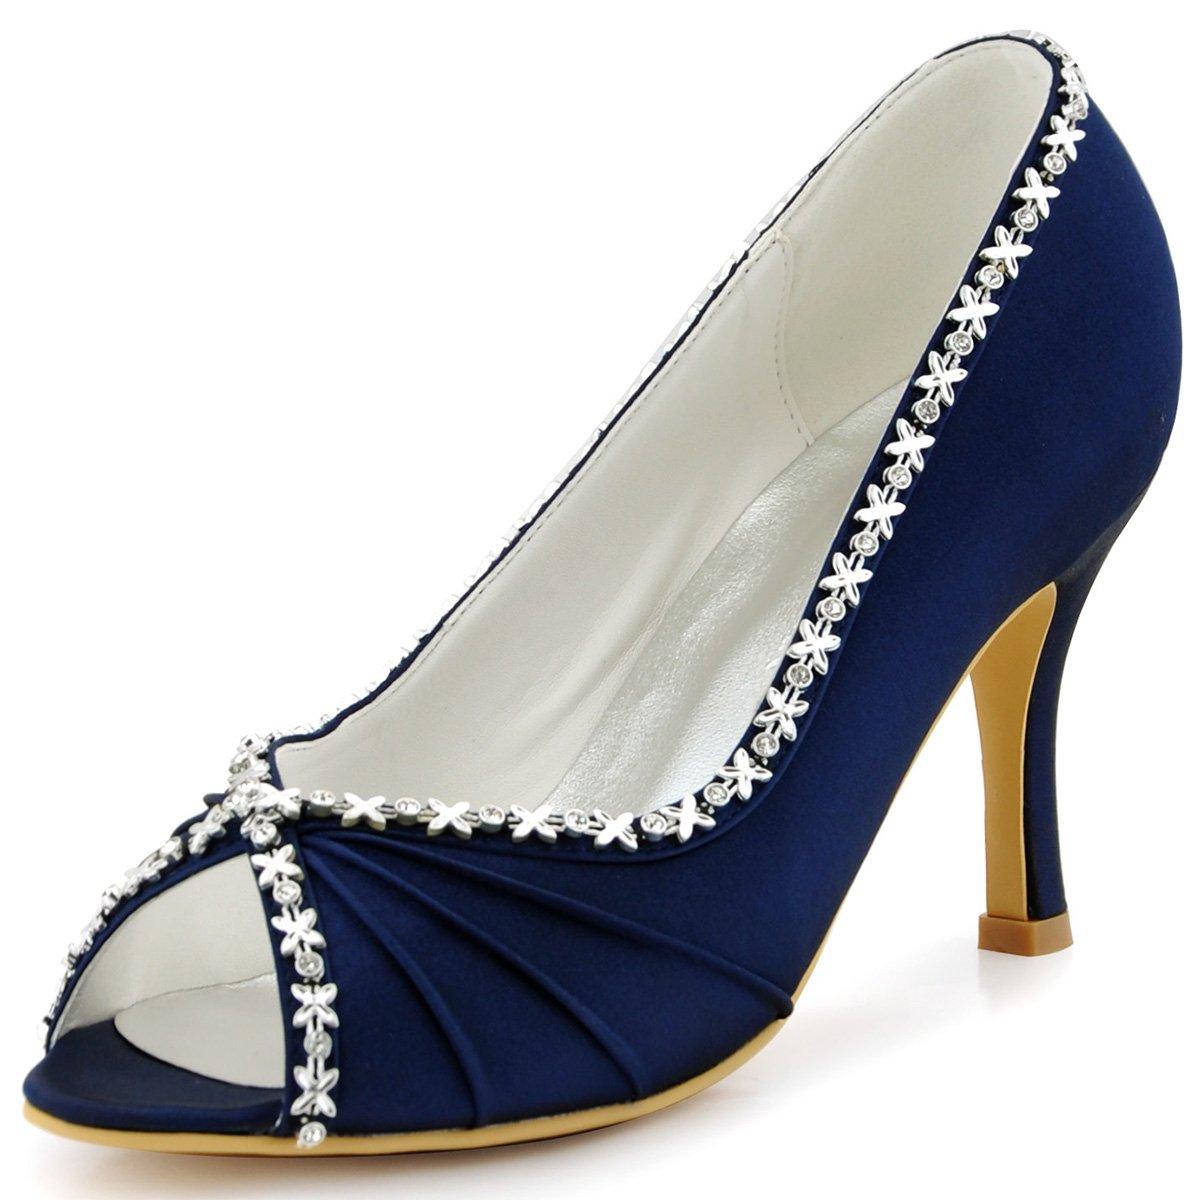 fa147864f Elegantpark EP2094 Women High Heel Pumps Rhinestone Pleated Peep Toe Satin  Evening Party Shoes Navy Blue UK 5  Amazon.co.uk  Shoes   Bags